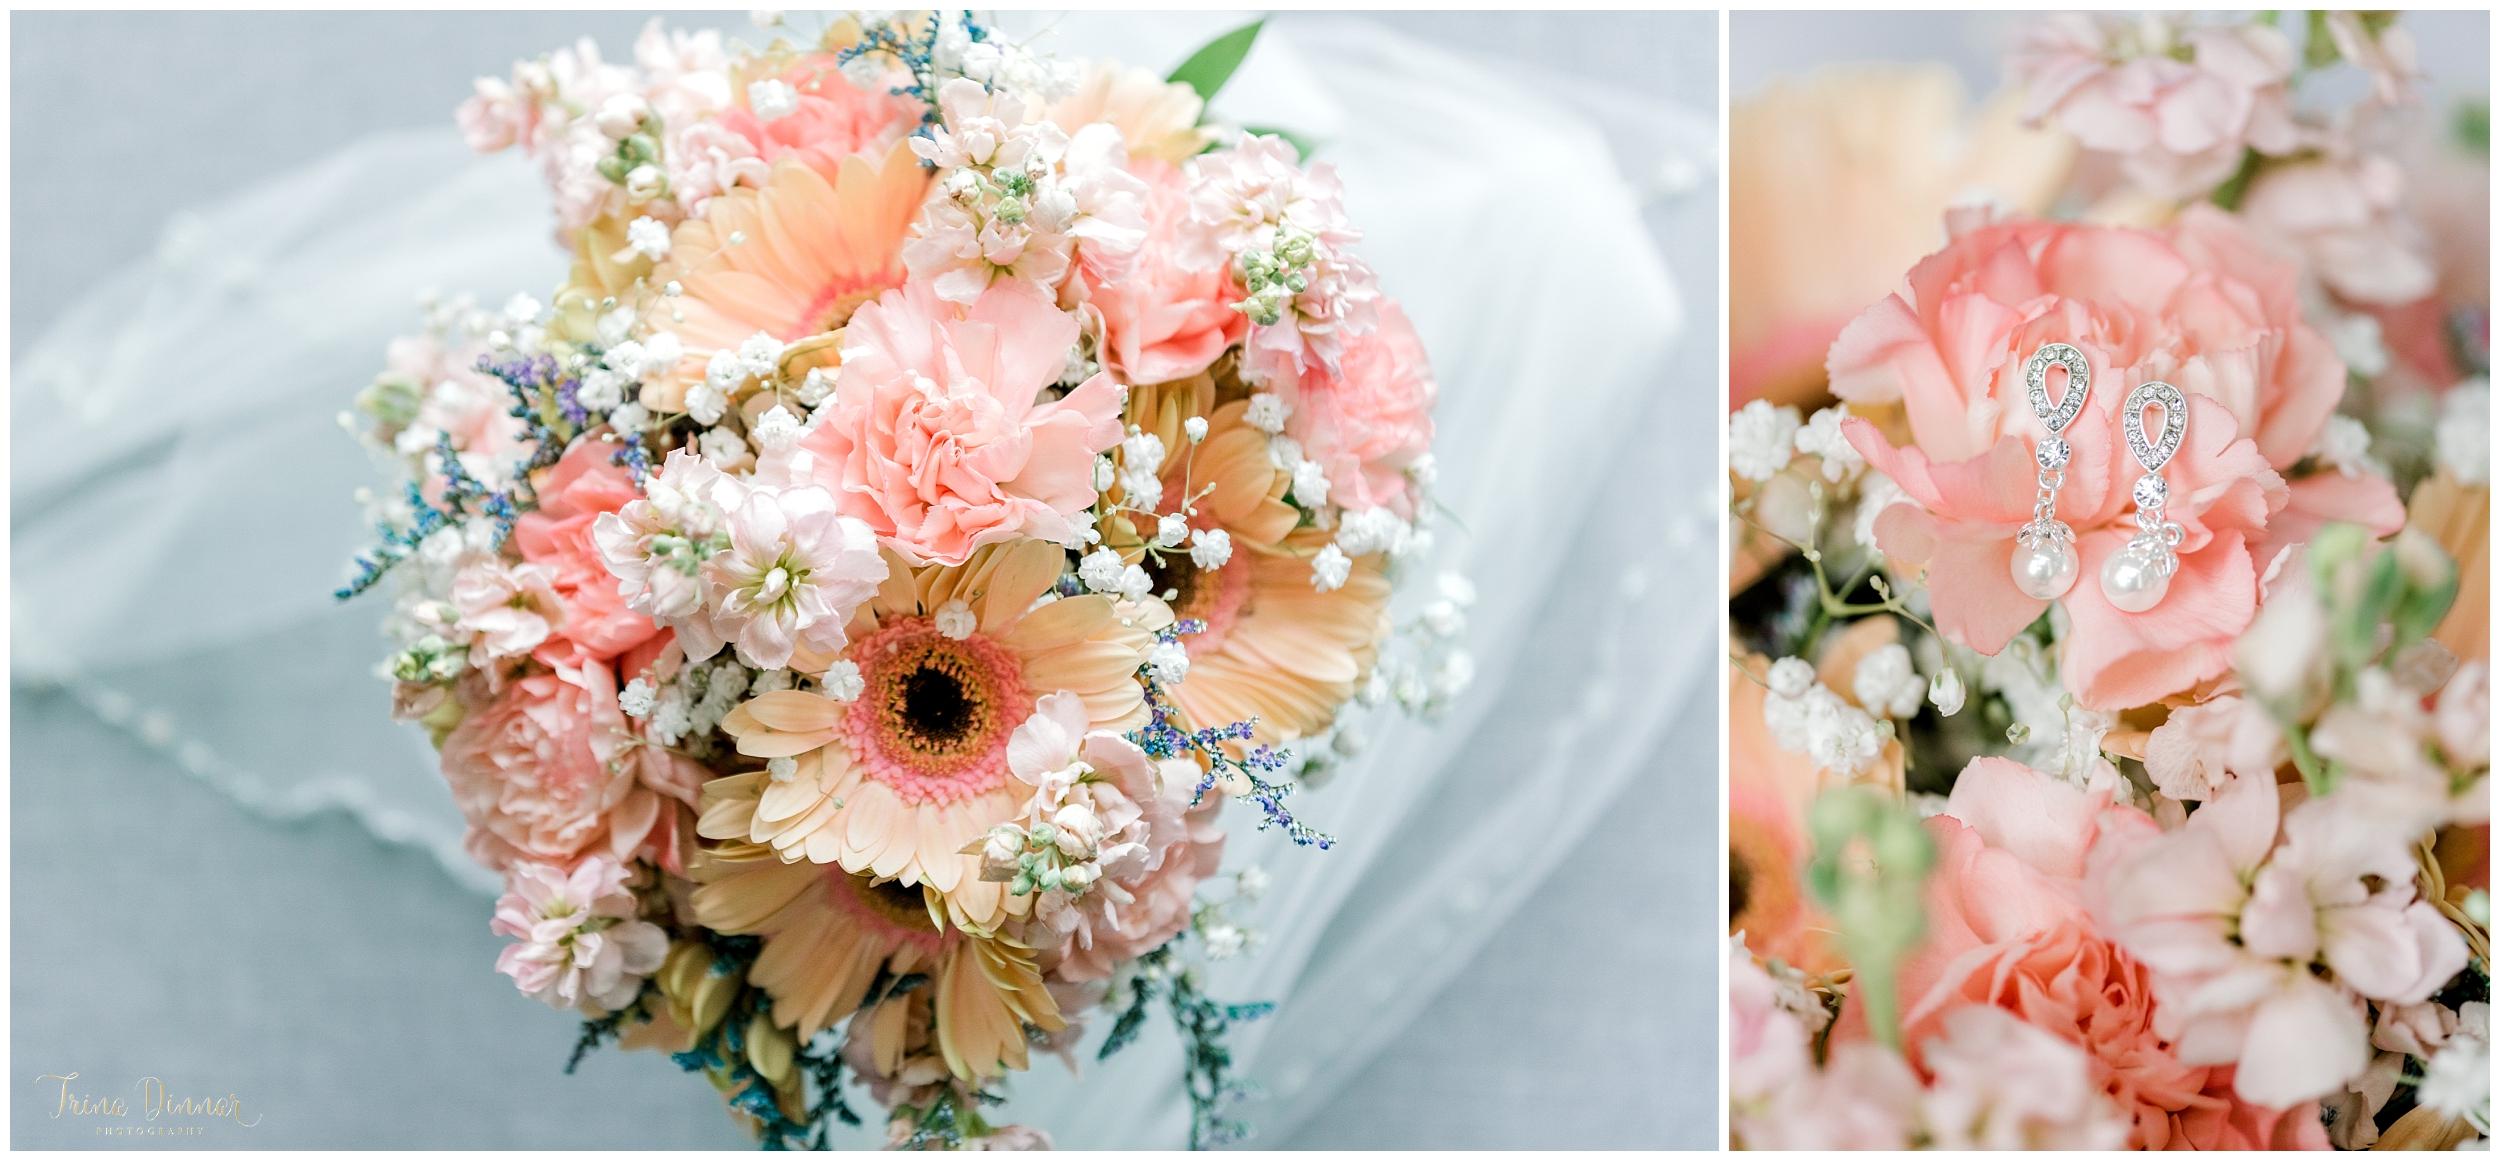 Downeast Flowers Kennebunkport Maine Wedding Florist